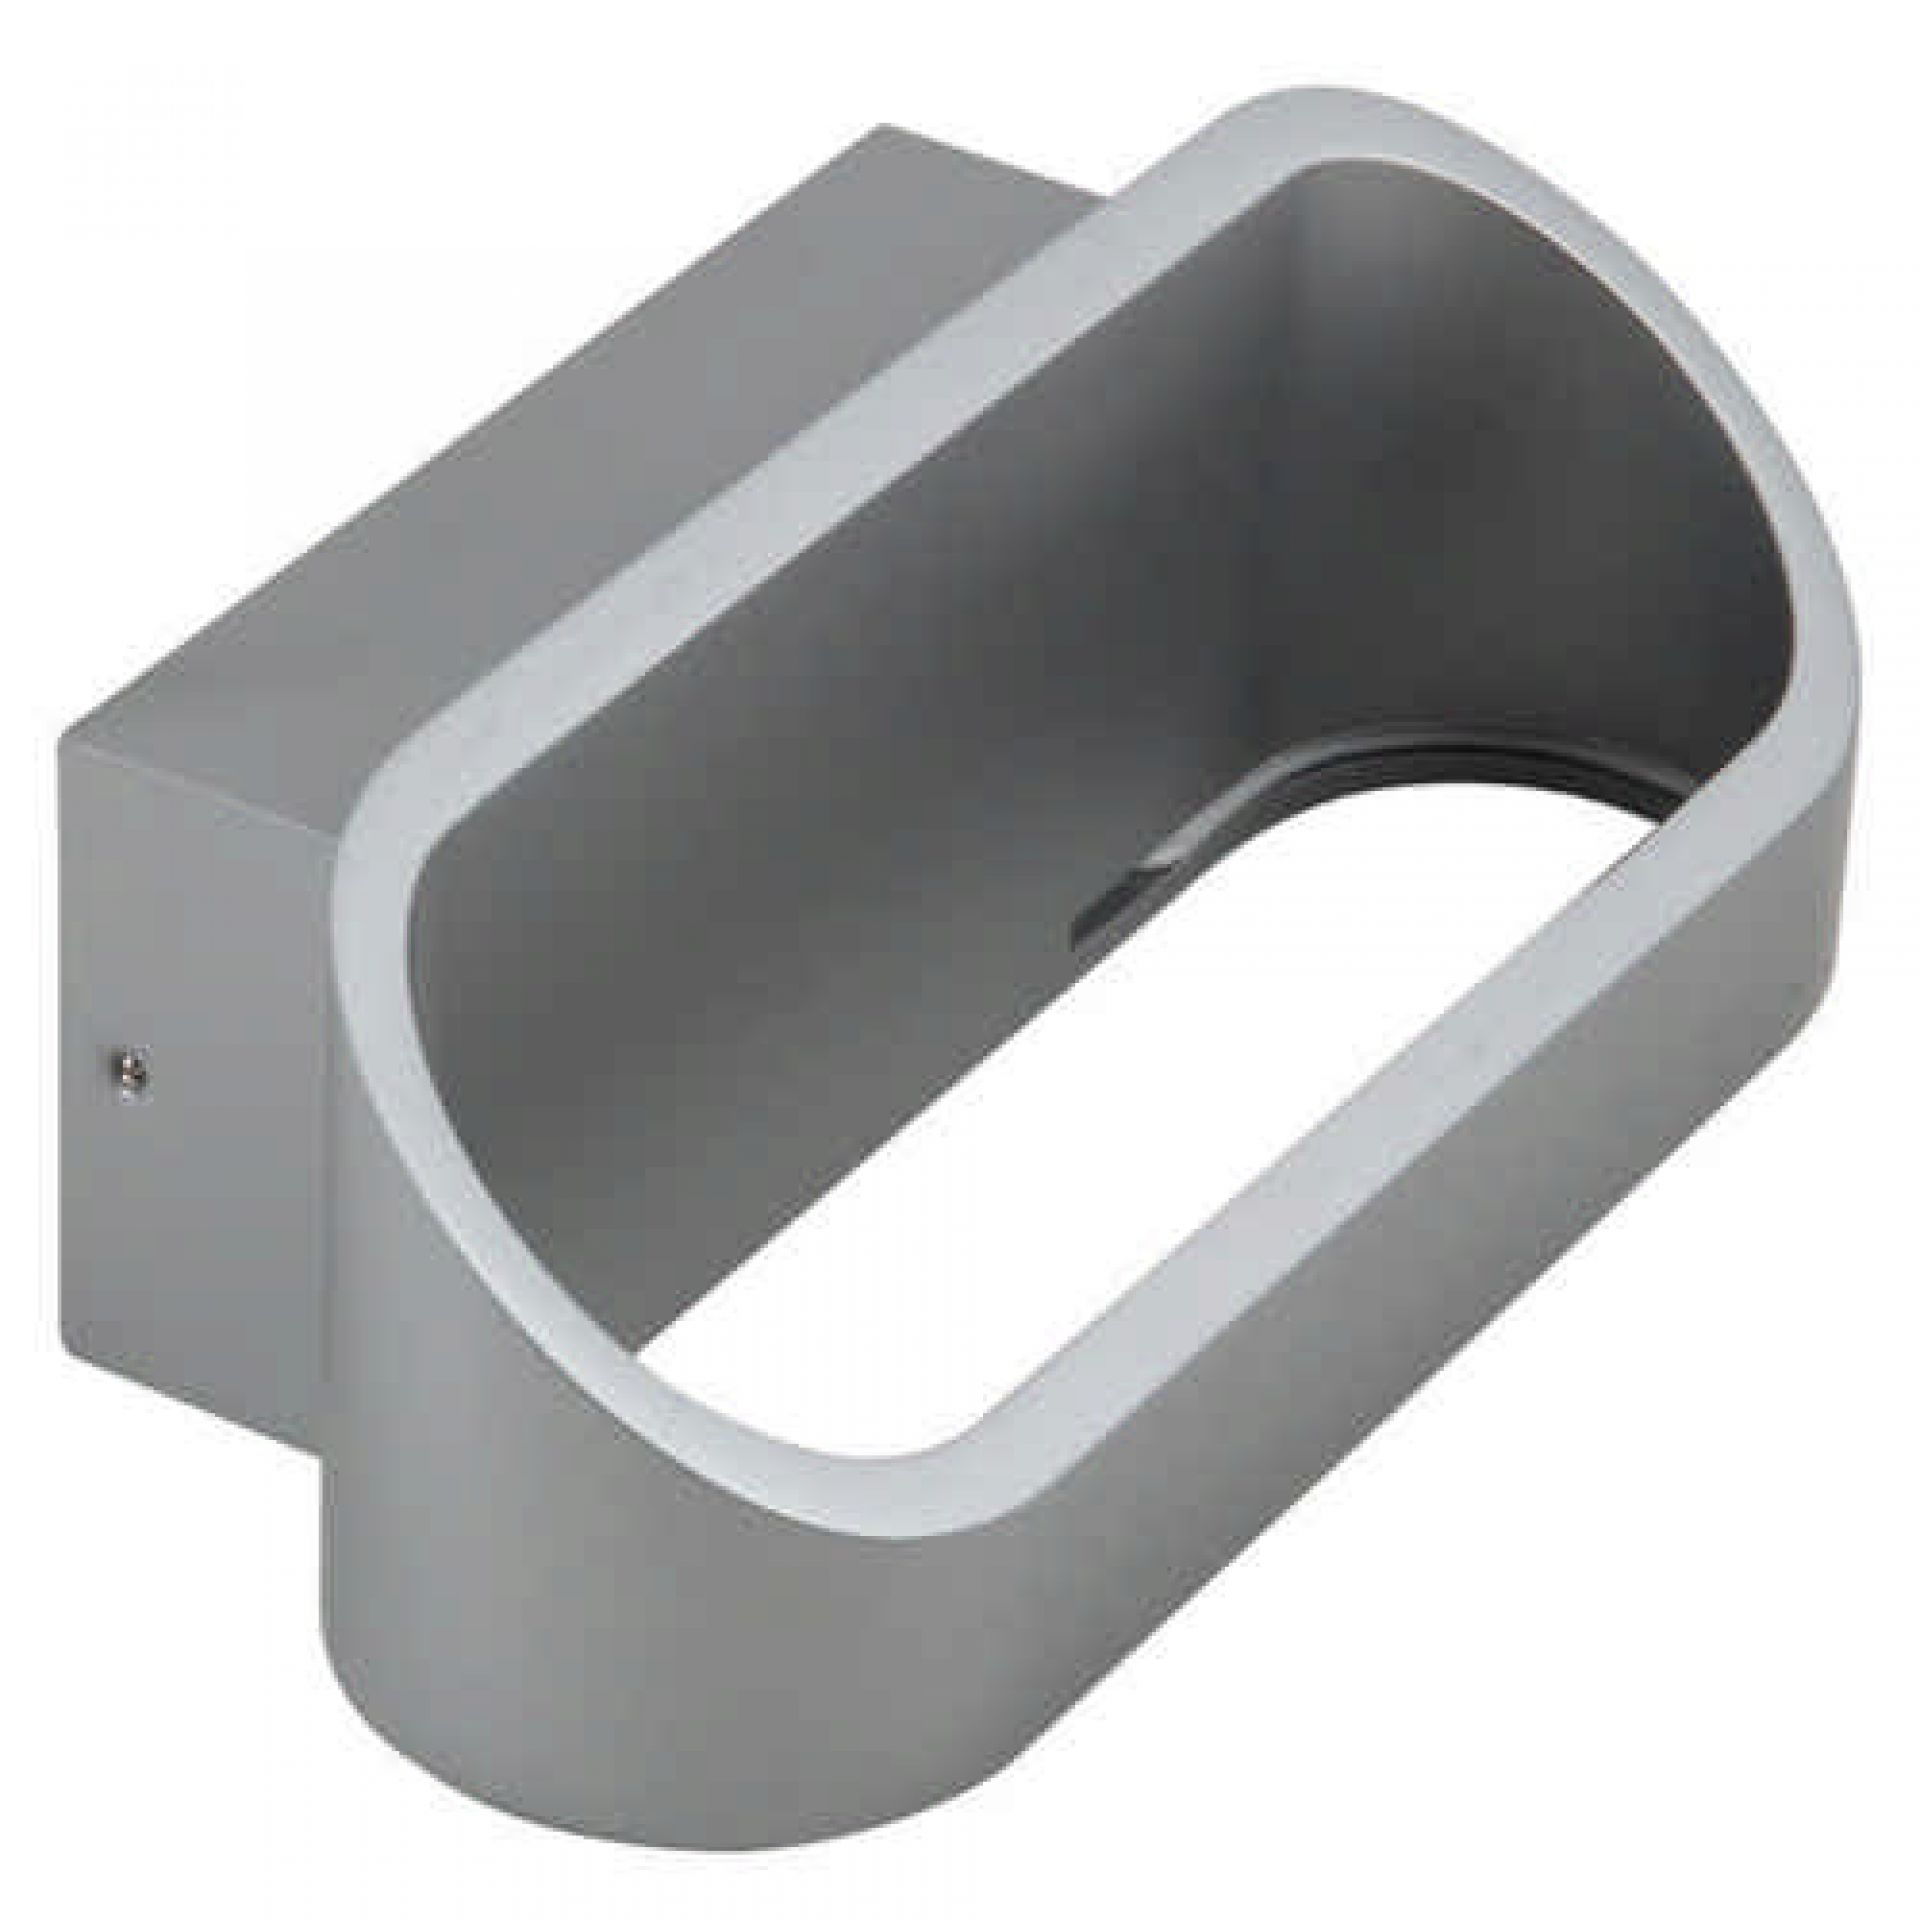 LED Wandleuchte Agrinio 6,5 Watt 3000 K 180x92 mm silber Aluminium IP20